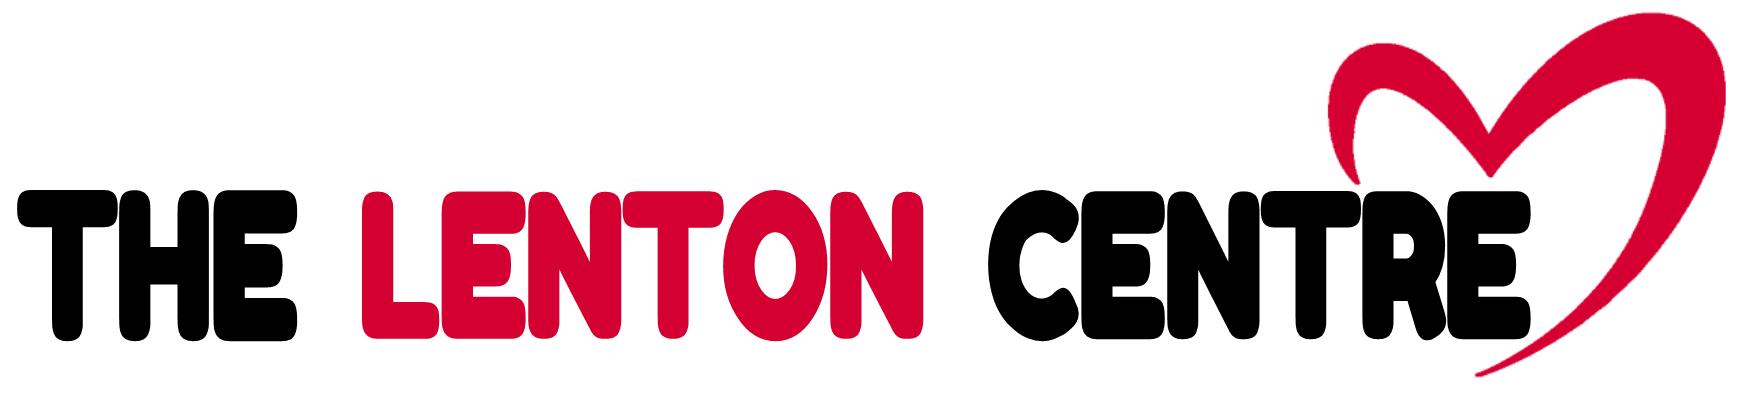 The Lenton Centre